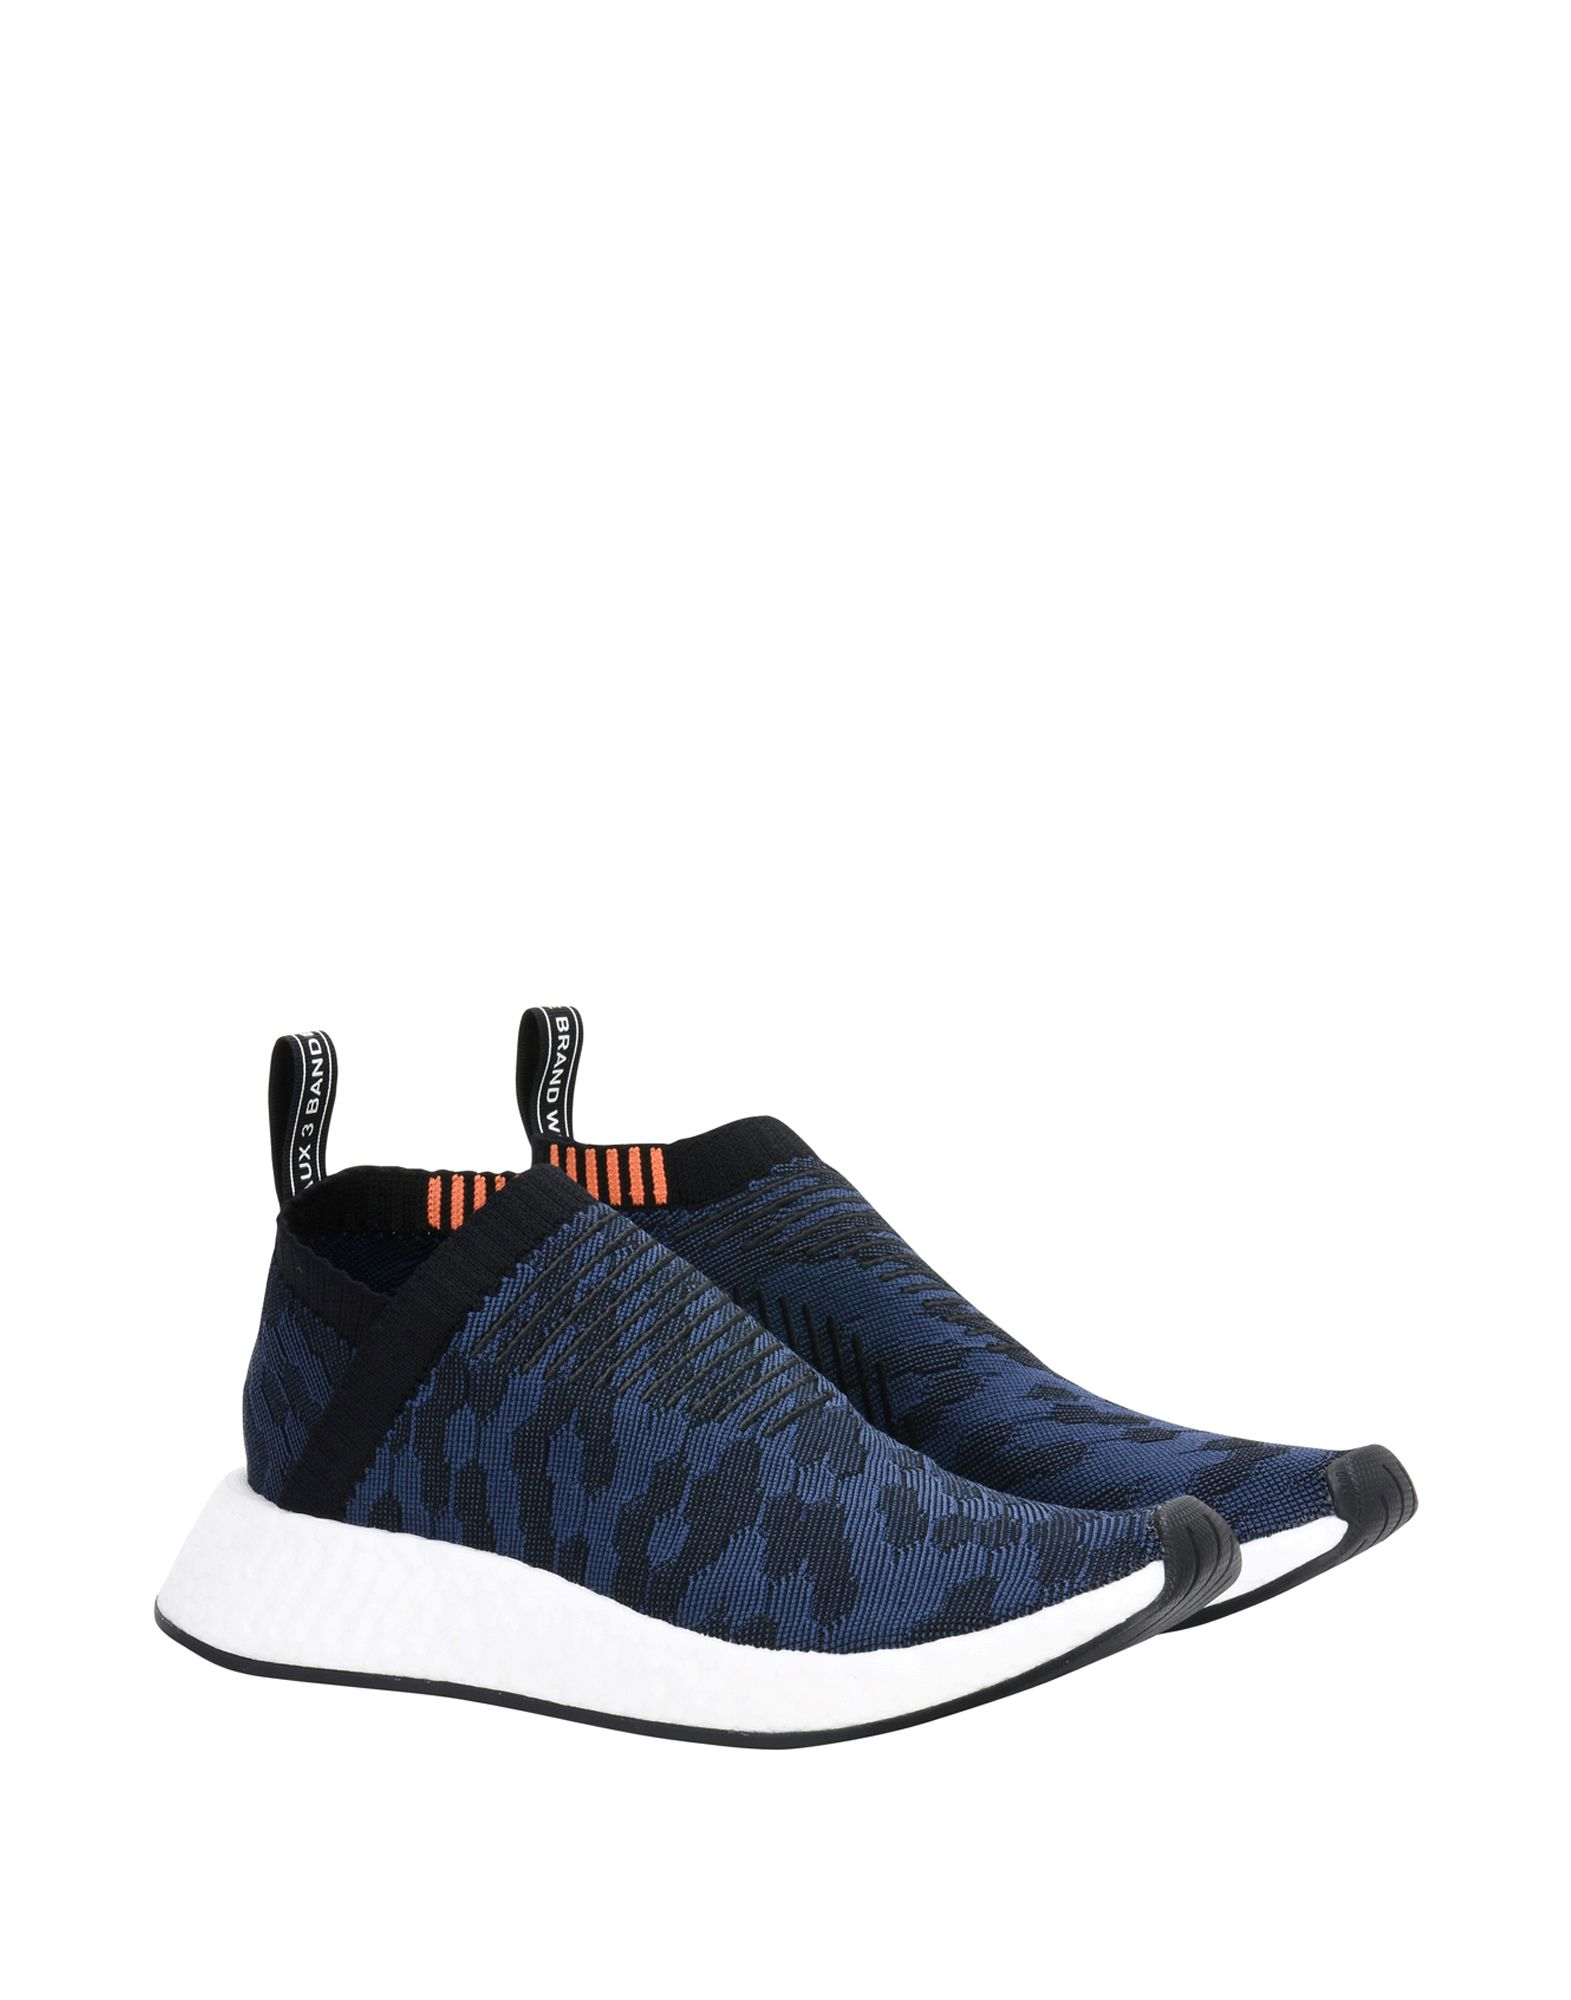 Sneakers Adidas Originals Nmd_Cs2 Pk W - Femme - Sneakers Adidas Originals  sur ...